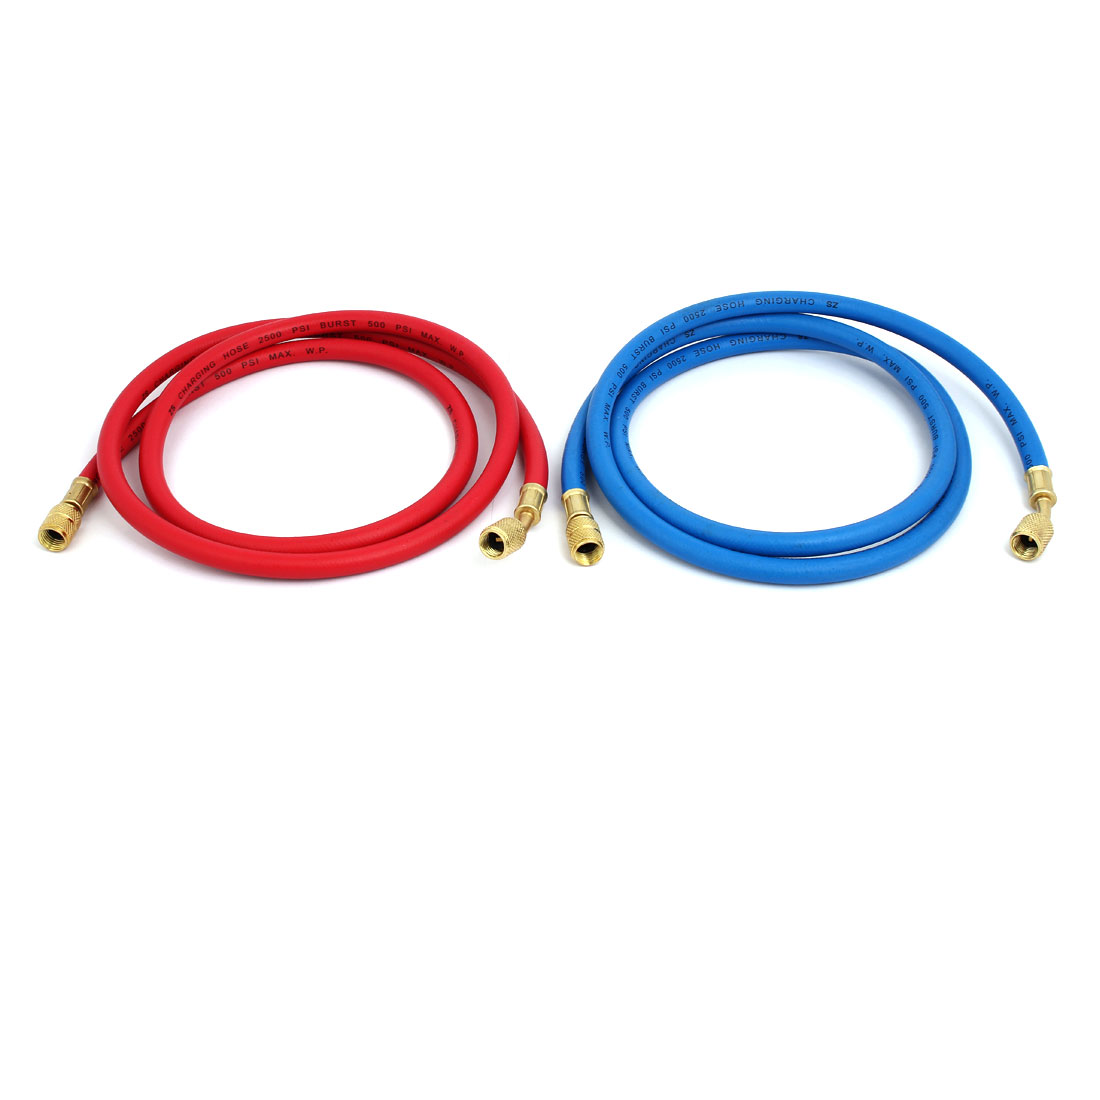 2pcs 1.36M 1/4NPT to M12 Refrigeration Charging Hose for AC Refrigerant R22 R134